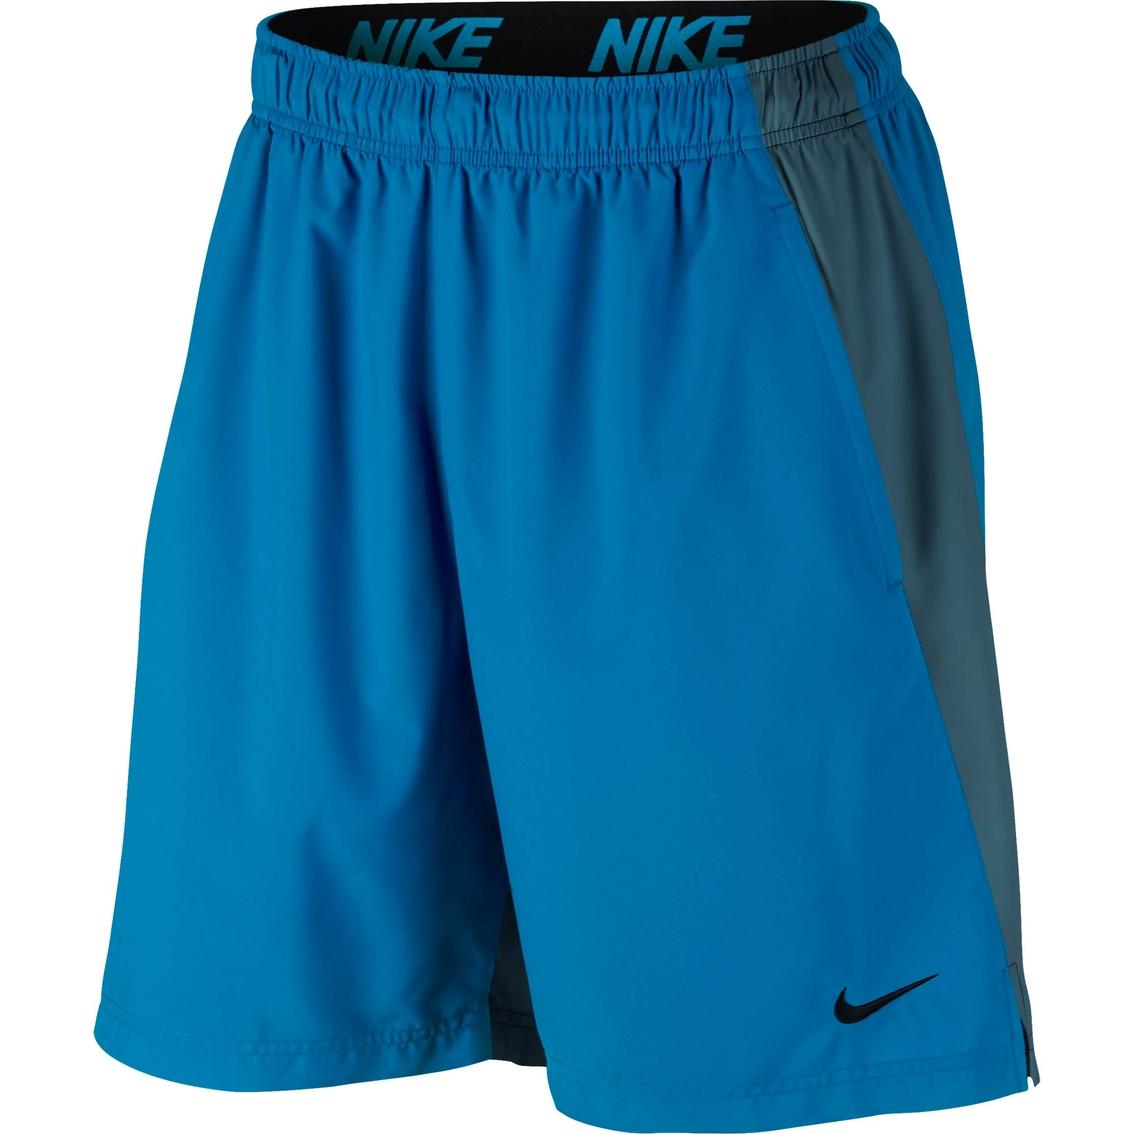 a179e44f48b3 Nike Men s Flex Woven Shorts